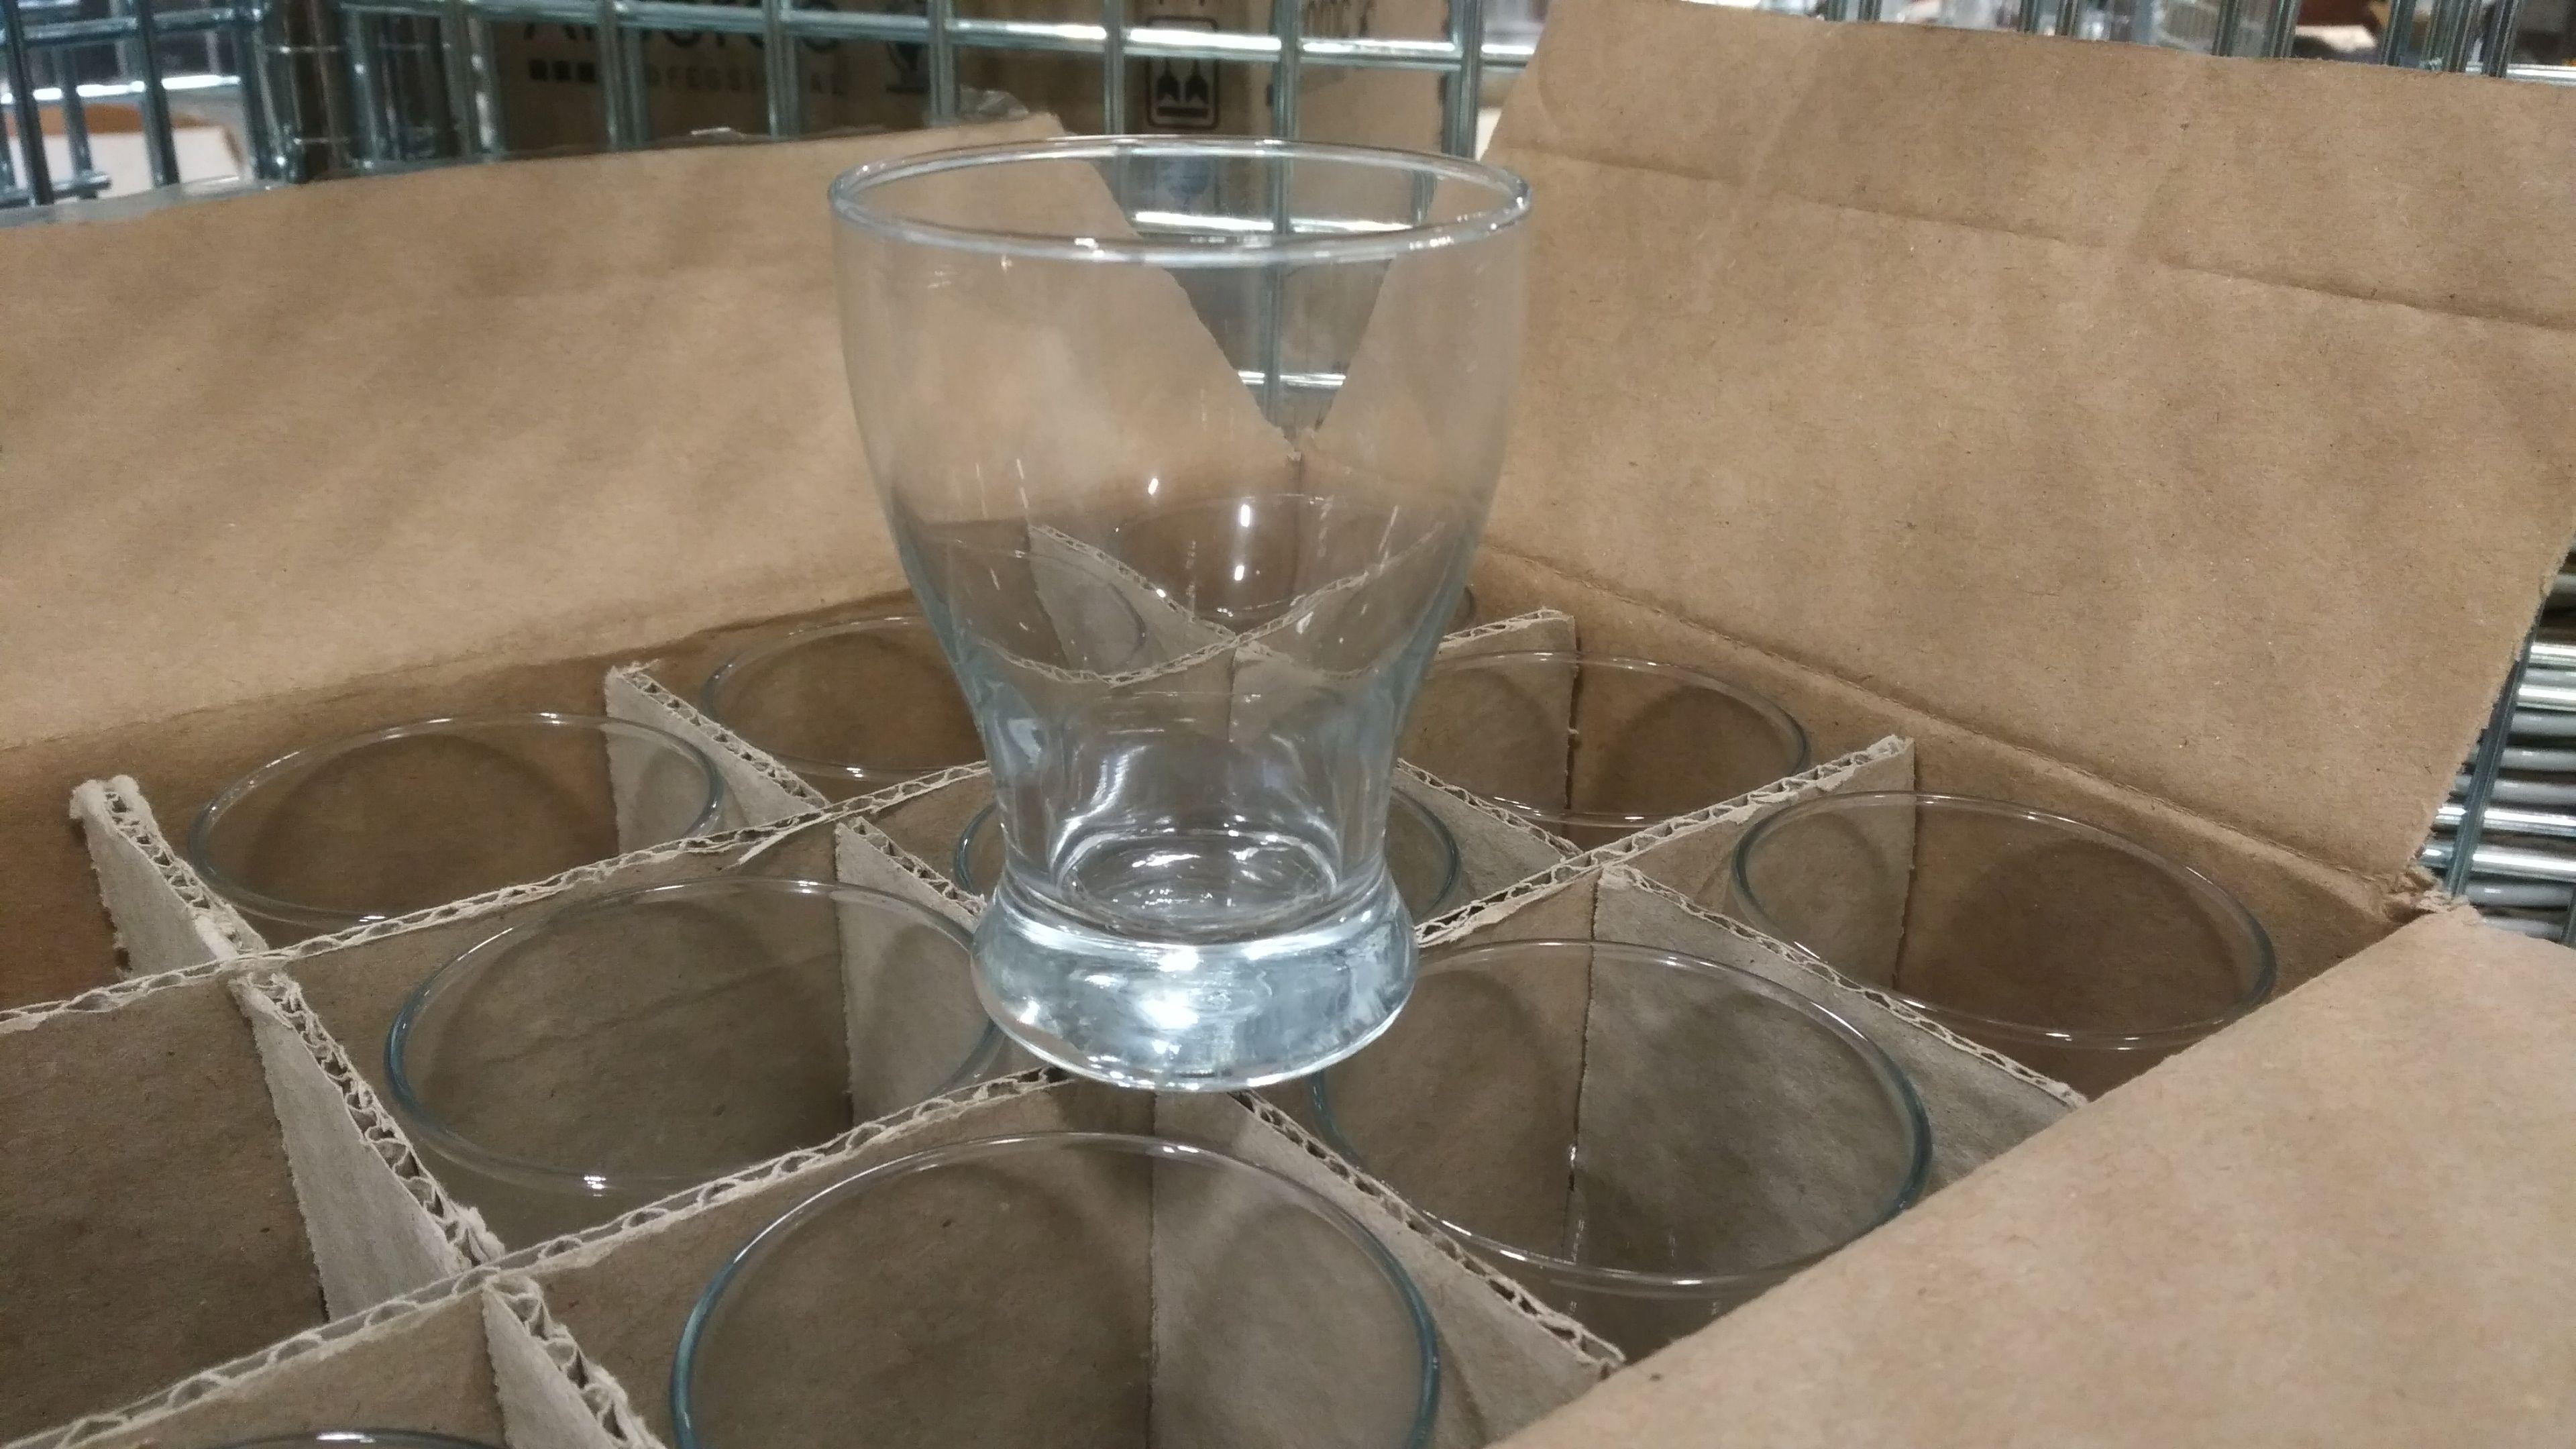 Lot 23 - Libbey 7oz Juice Glasses - Lot of 23